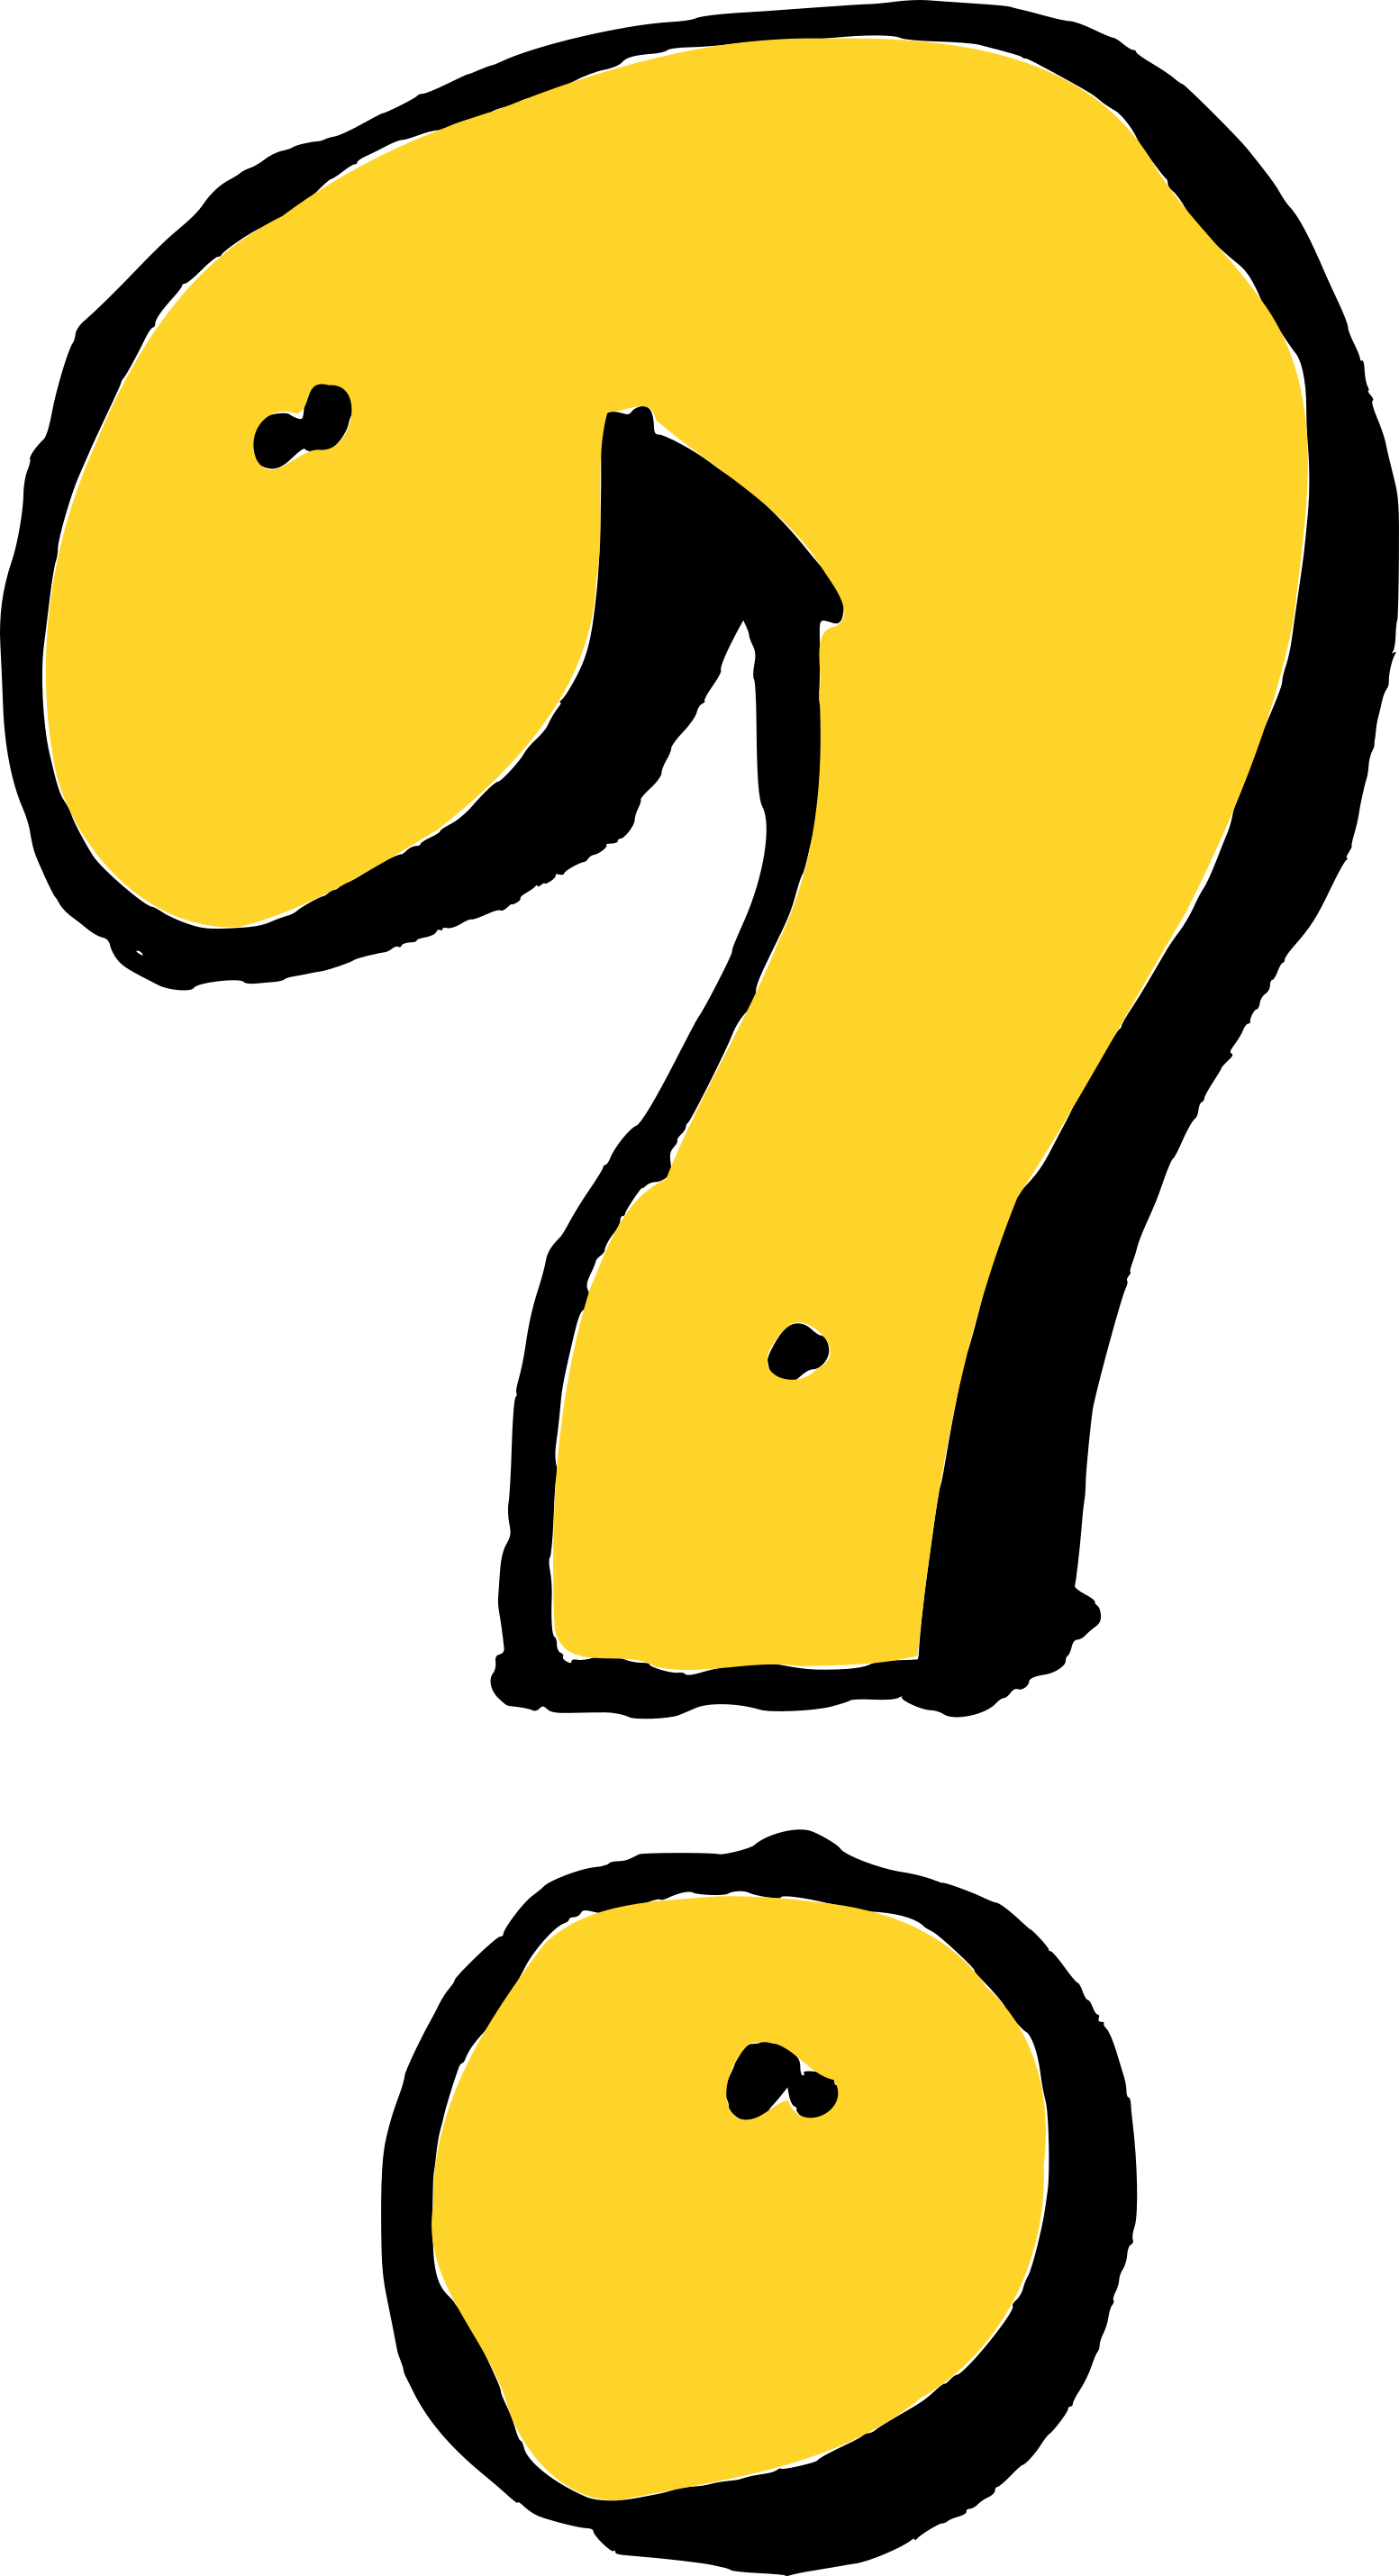 4 comic question mark  png transparent